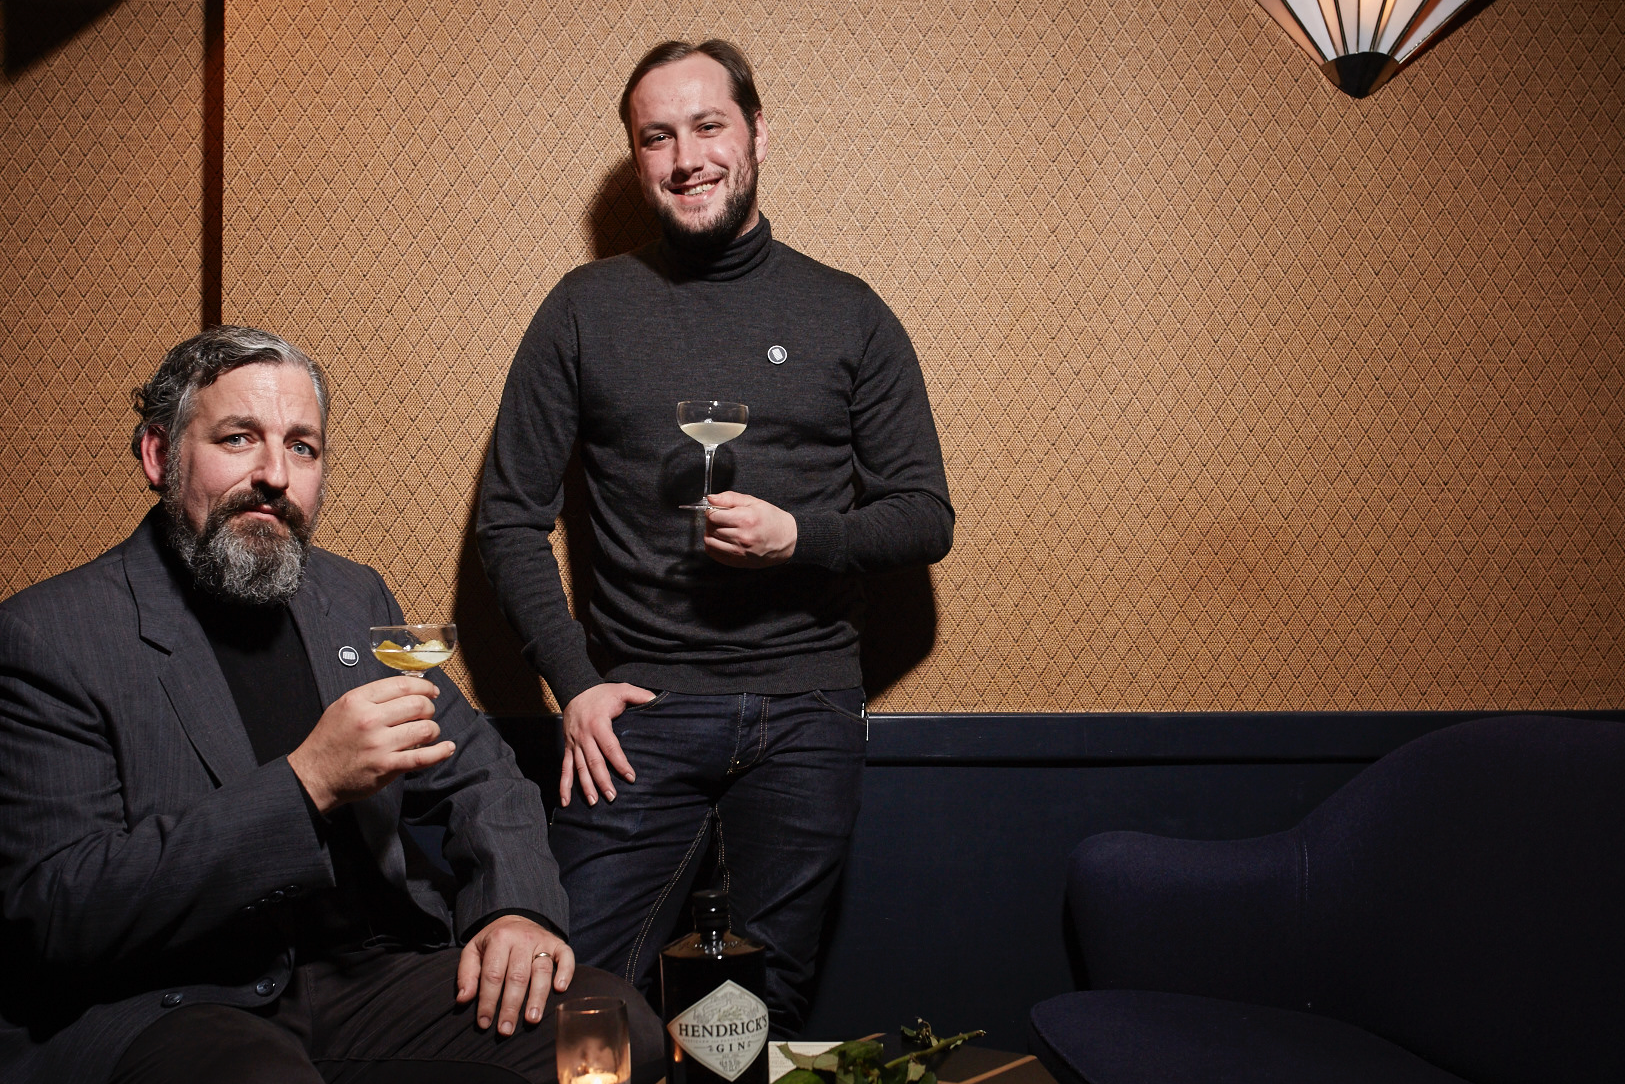 Pierre-Marie Bisson & Craig Judkins at Joyeux Bordel Turtleneck Club London Shoreditch